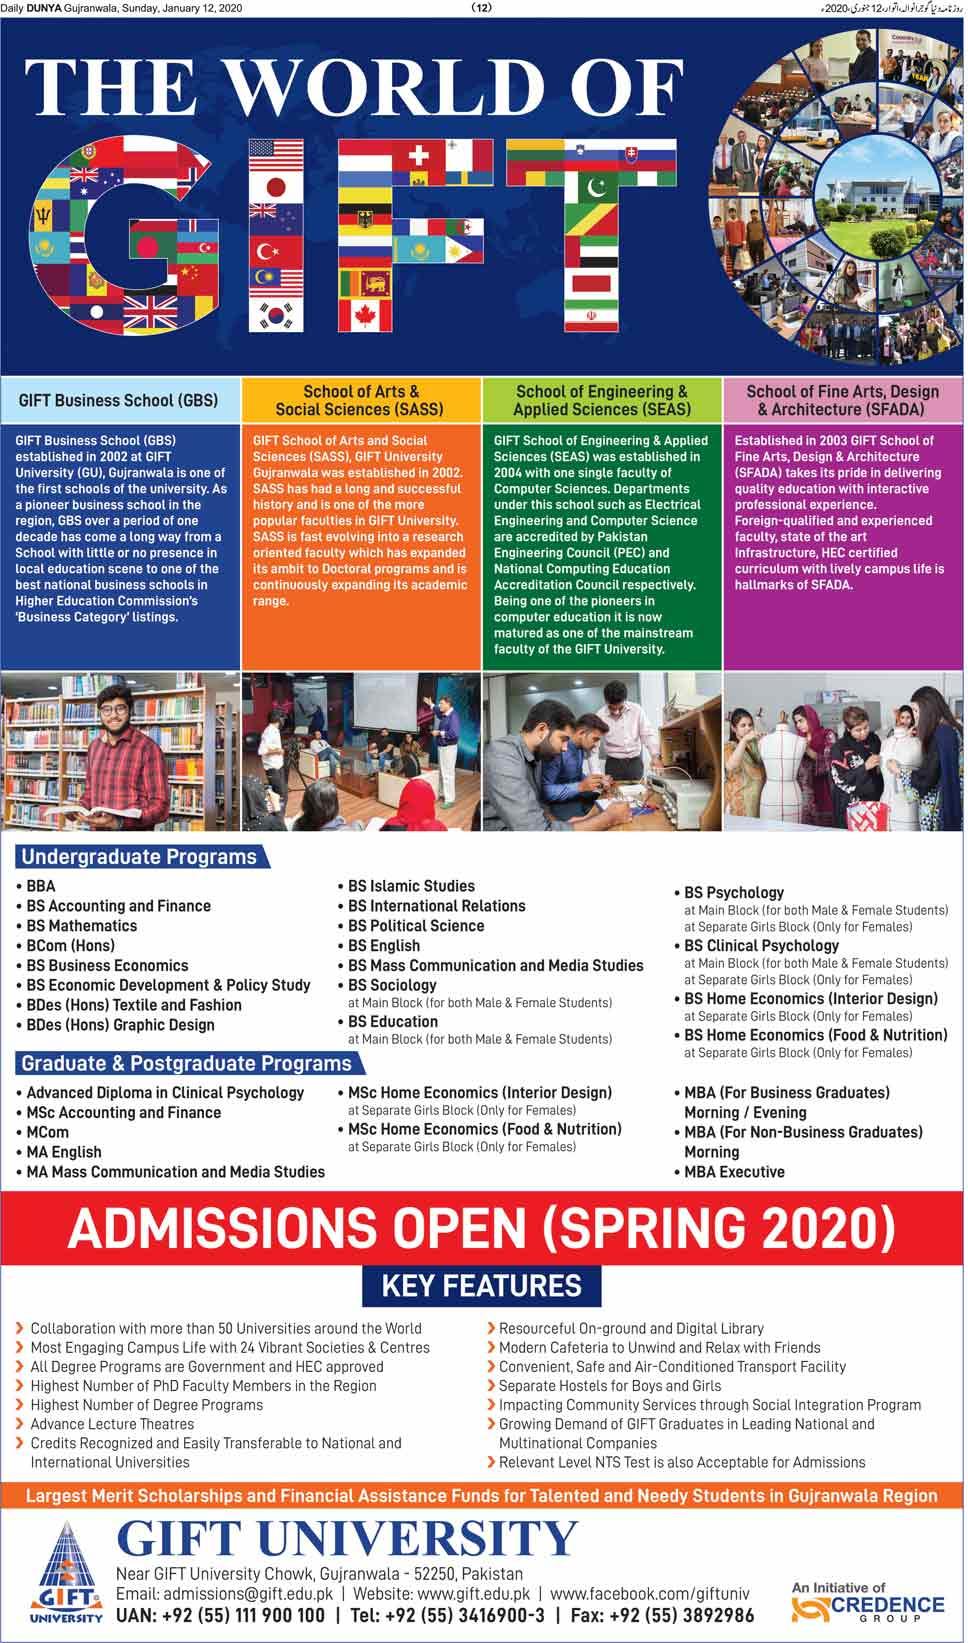 Gift University Gujranwala Admissions